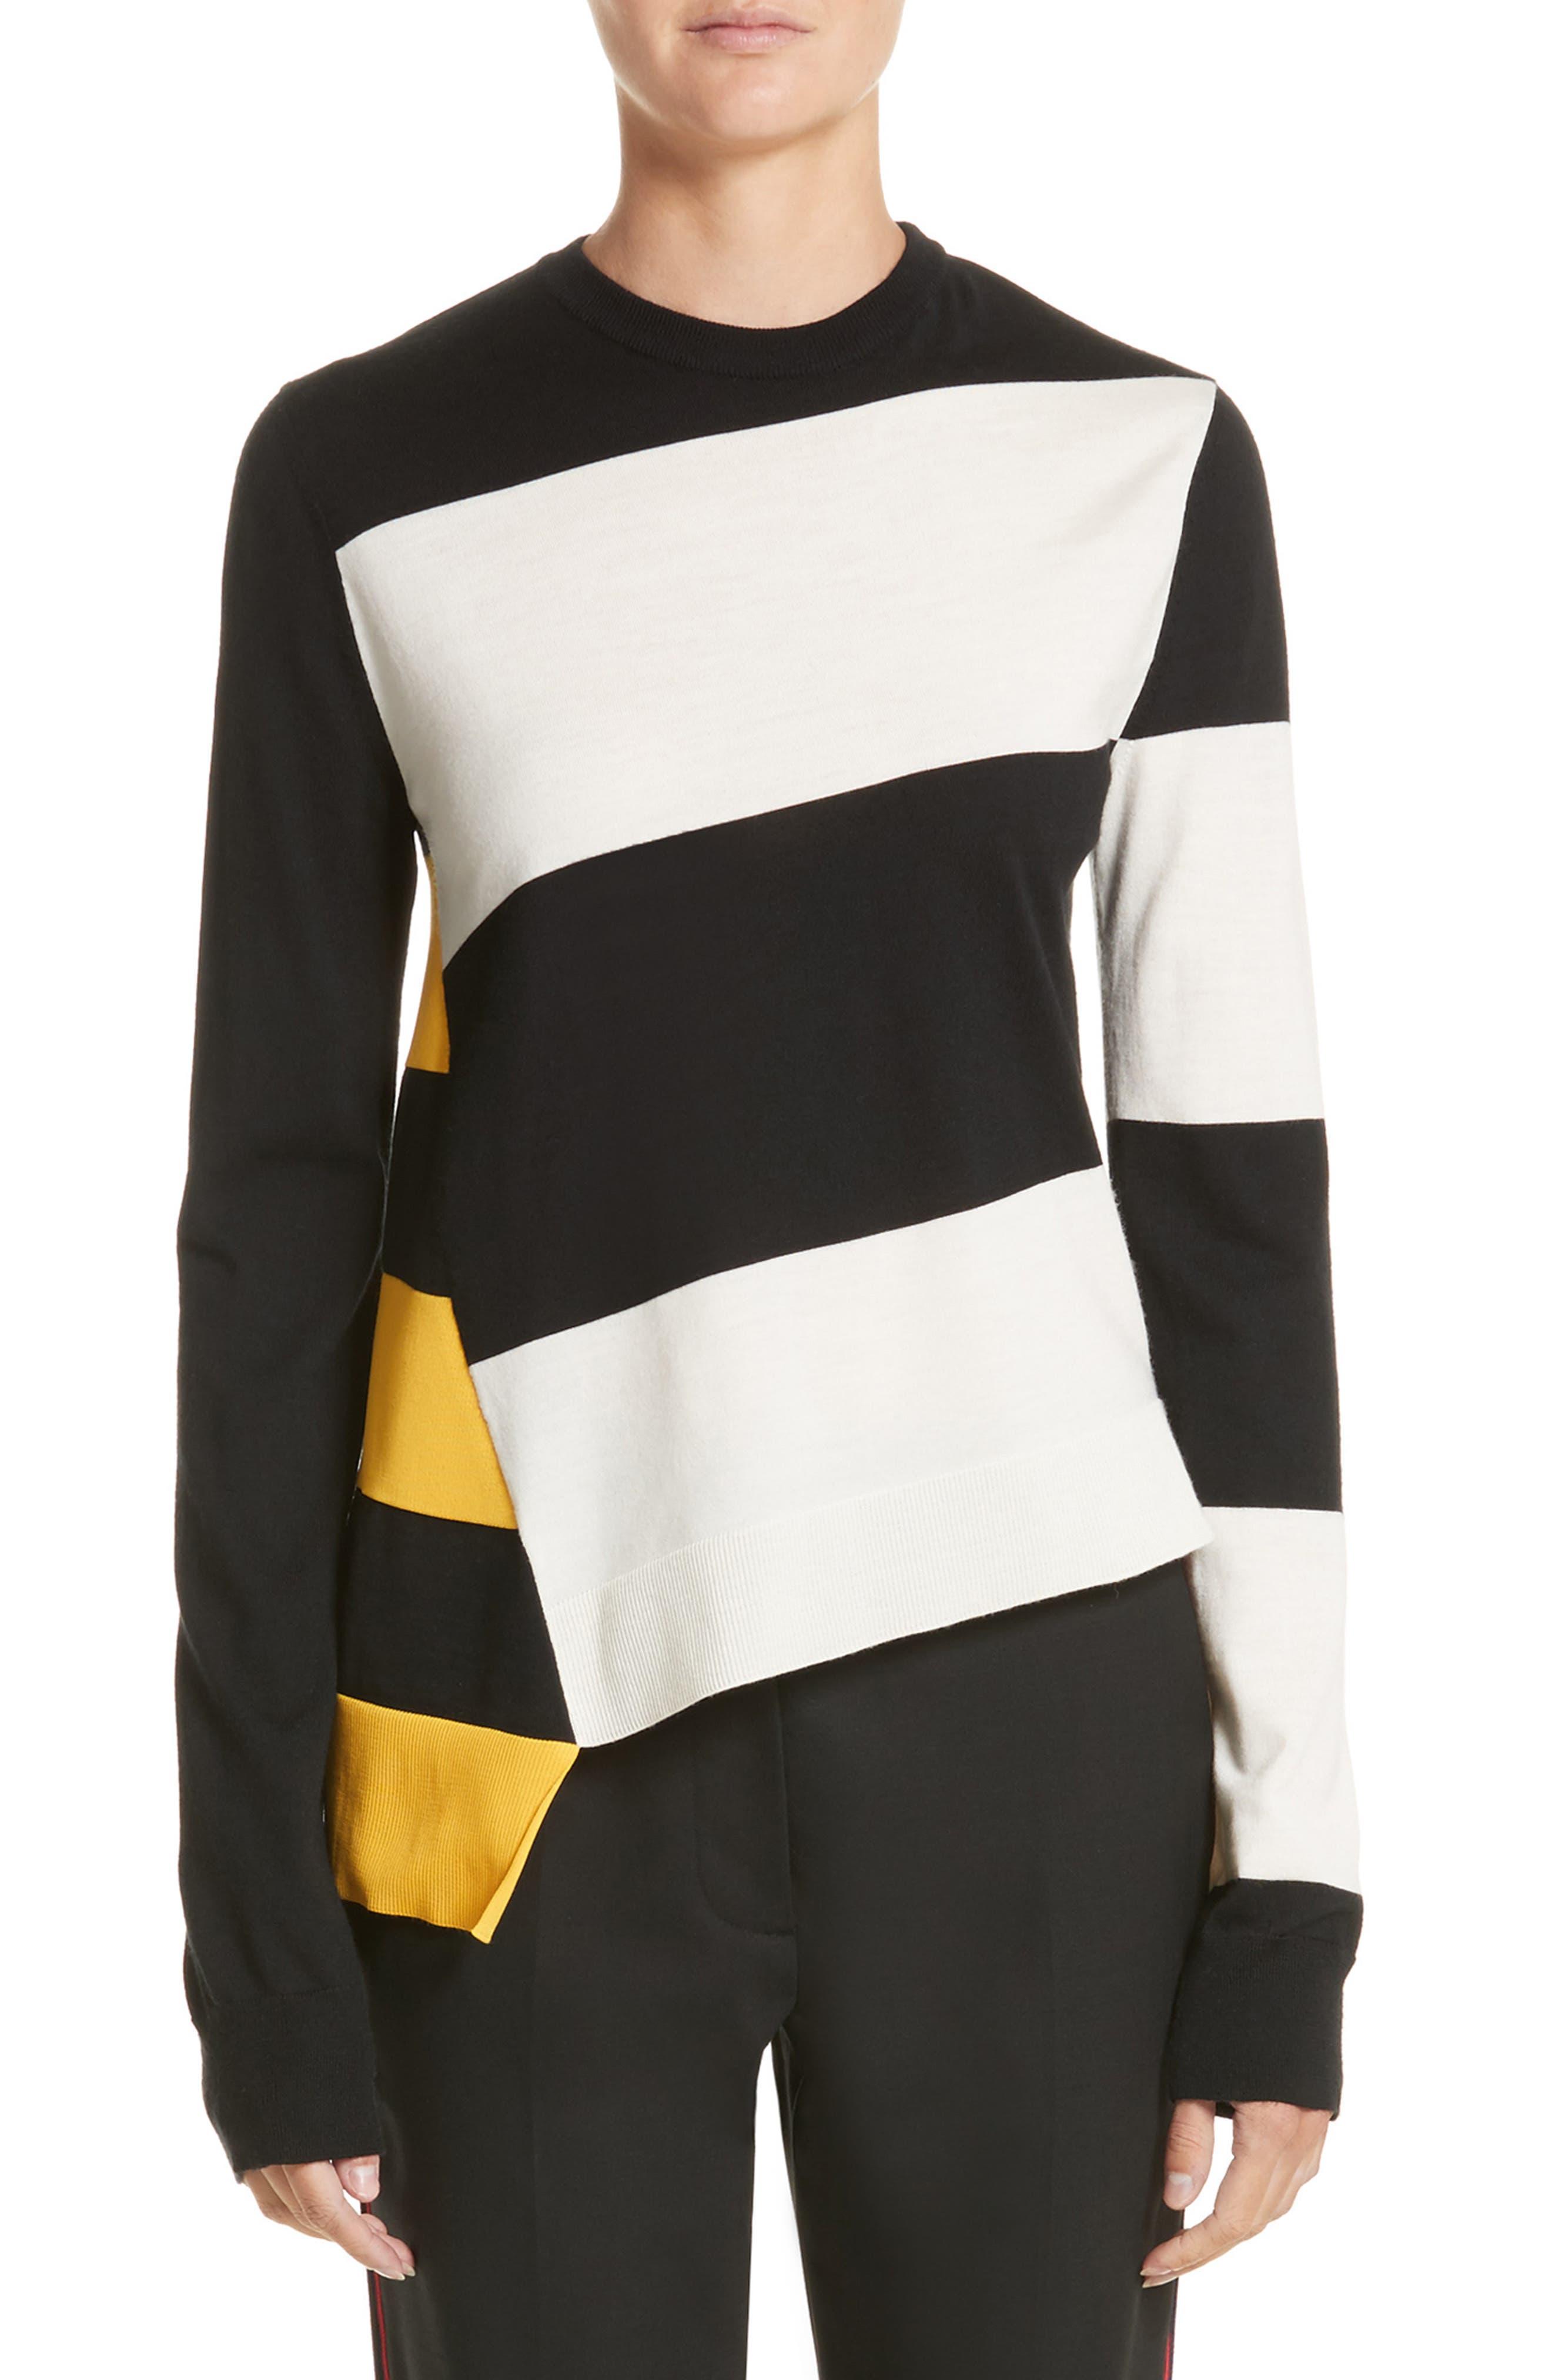 Bicolor Stripe Merino Wool Blend Sweater,                             Main thumbnail 1, color,                             Black/ Off White/ Yellow